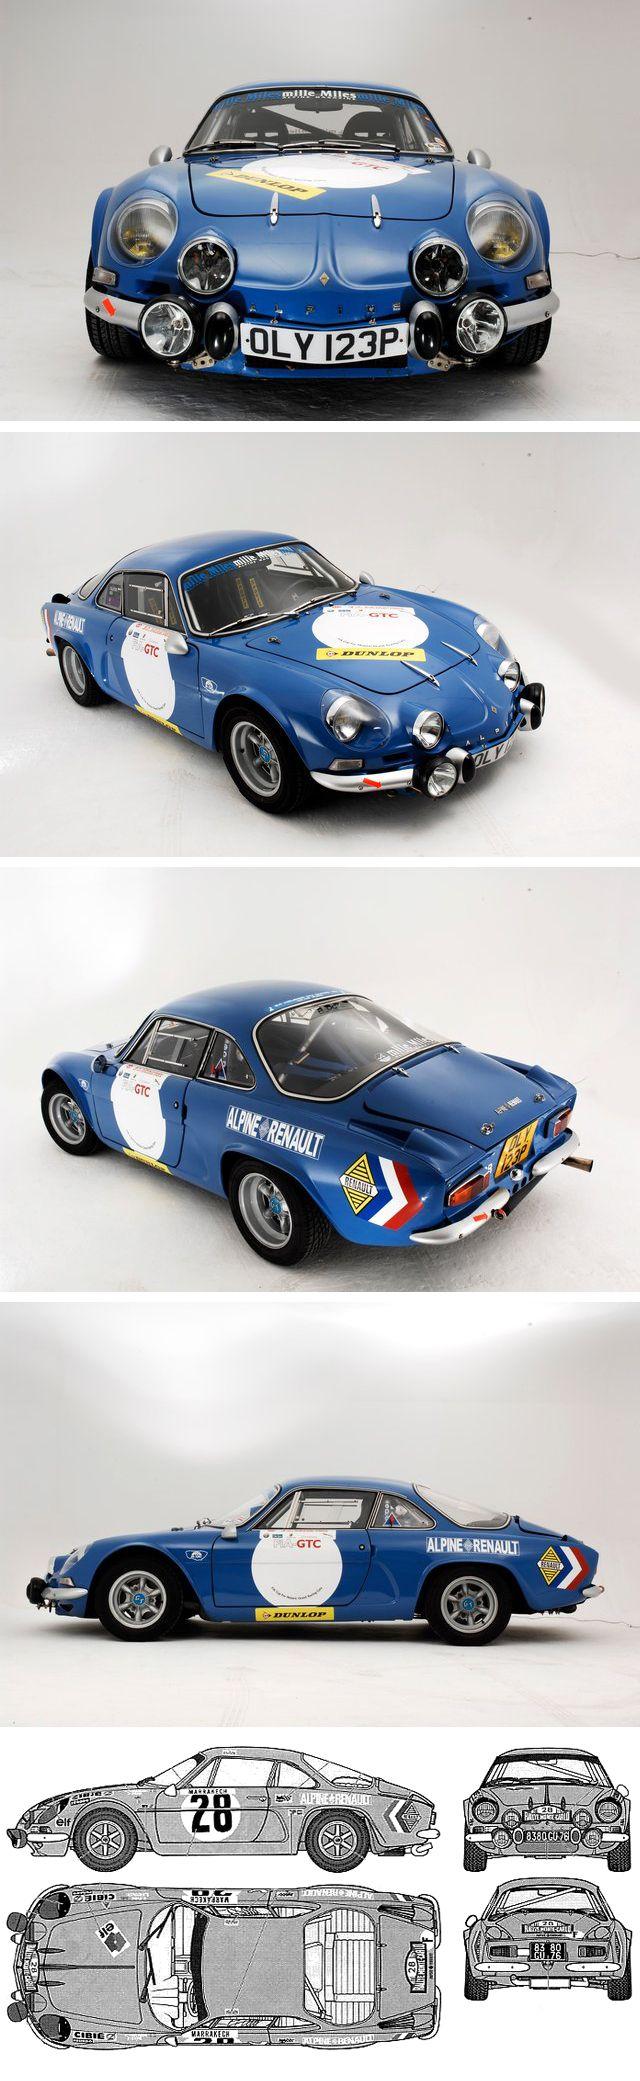 Alpine A110 - Alpine Renault (1962/1977)